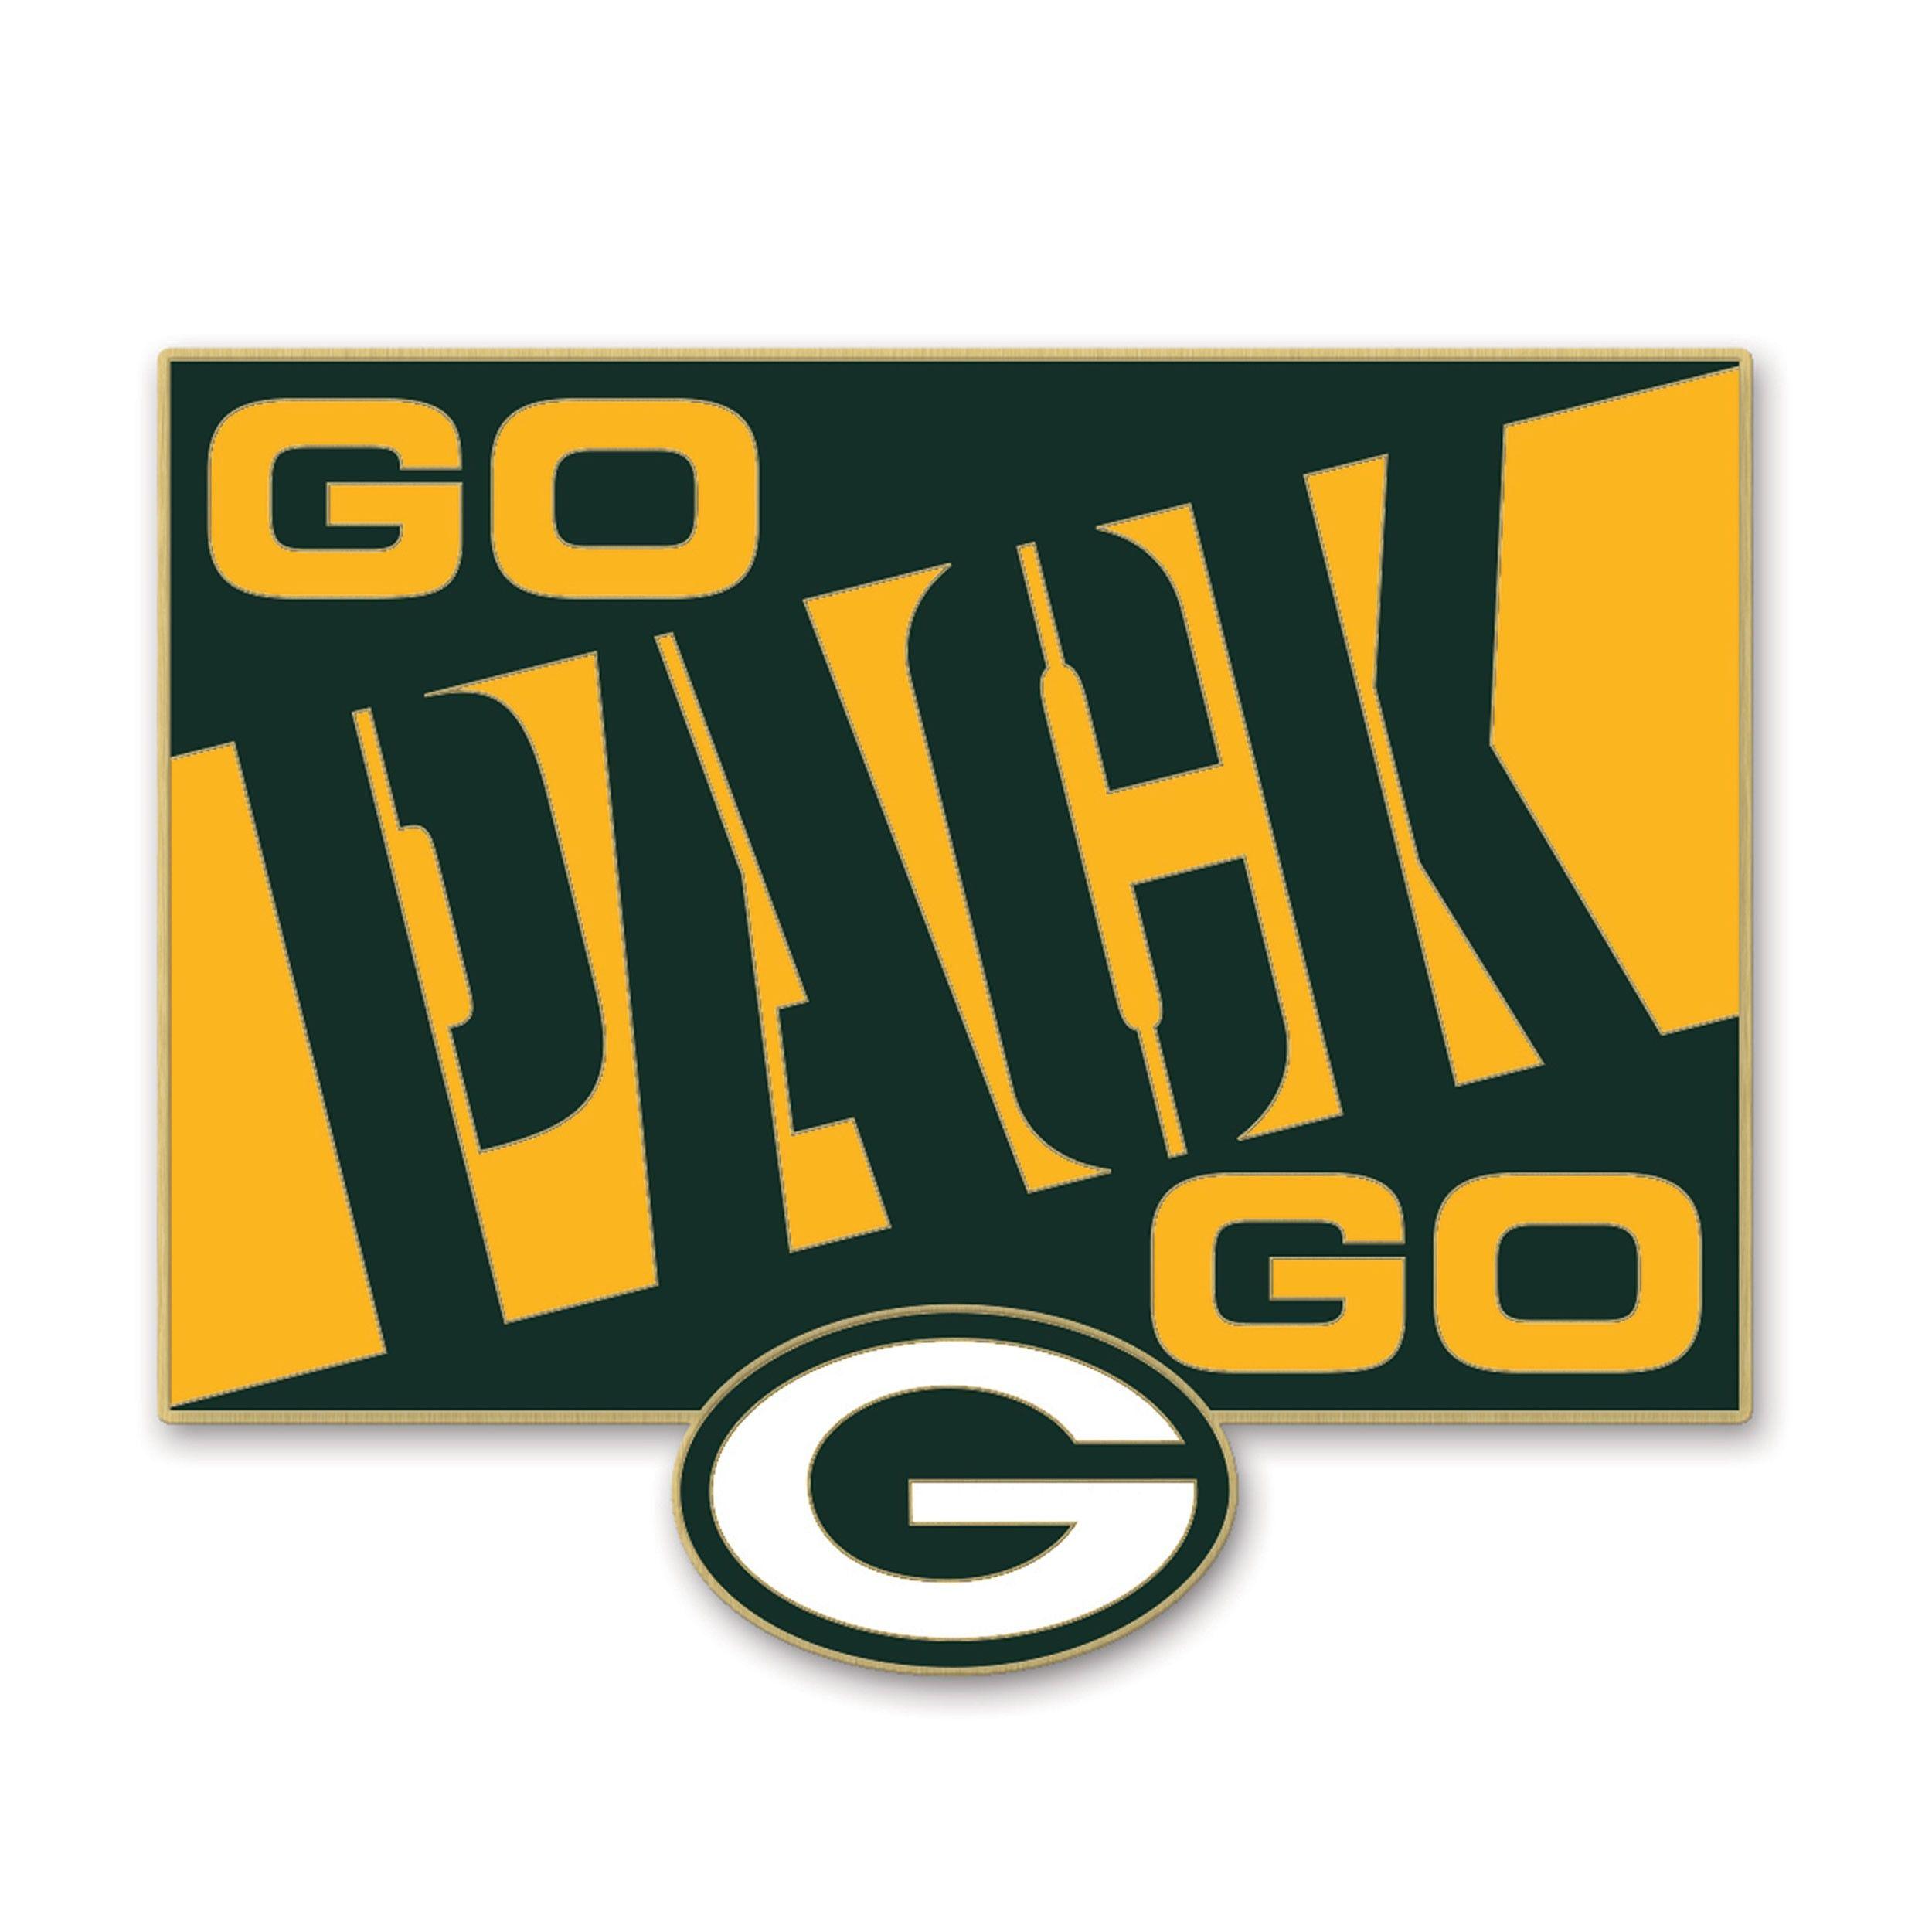 2206078199 37 13 2500 Jpg 2500 2500 Green Bay Packers Green Bay Packers